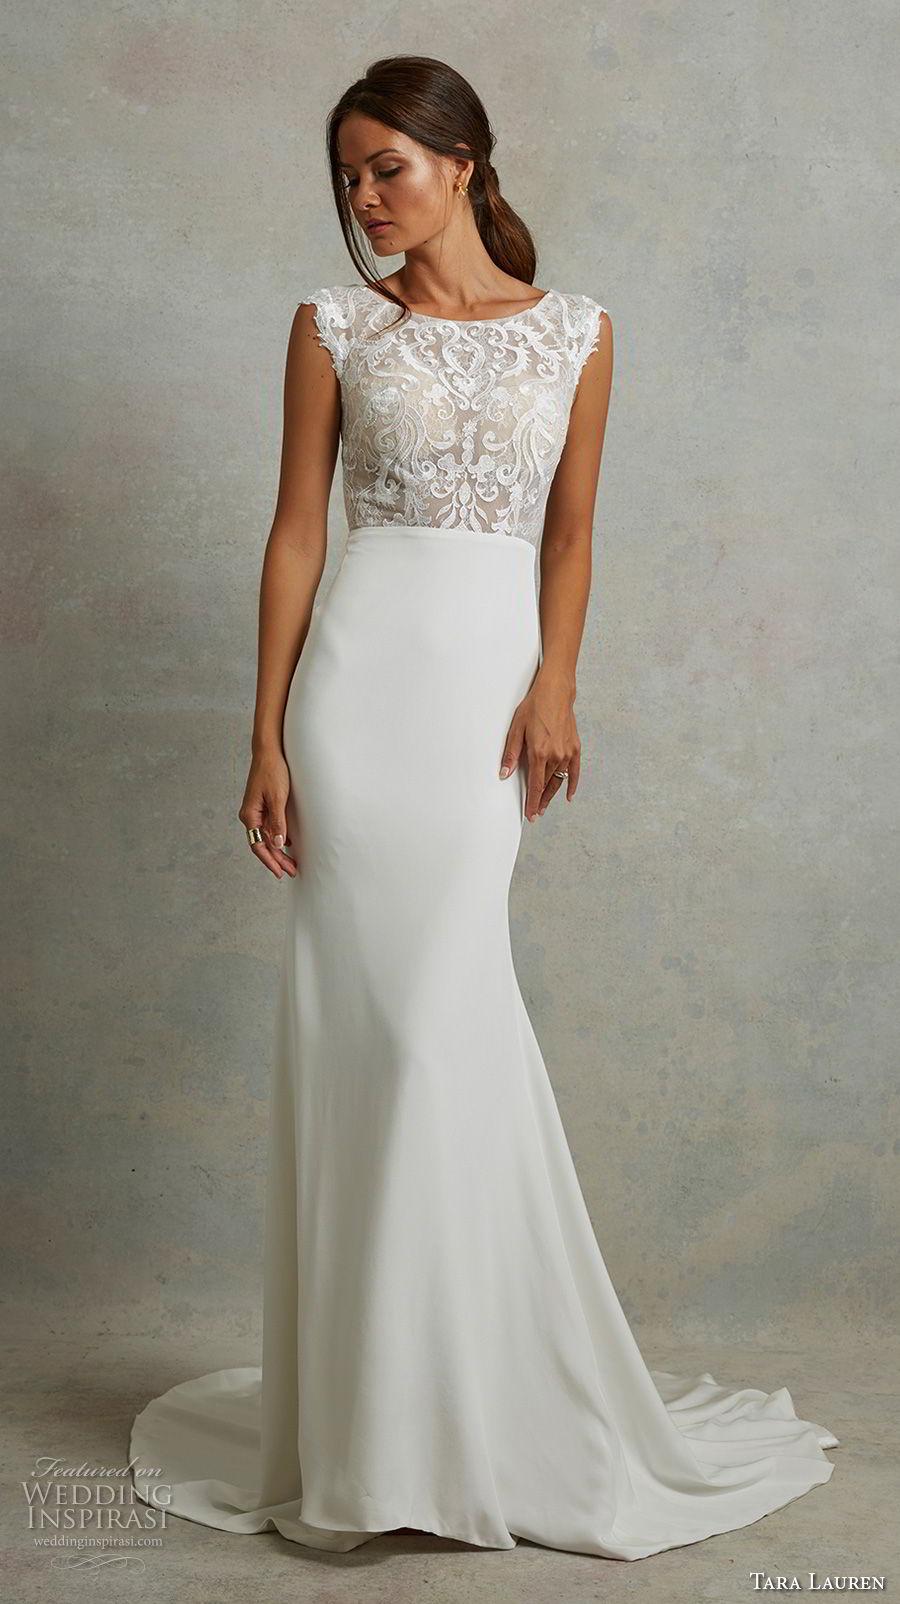 tara lauren spring 2018 bridal cap sleeves bateau neck heavily embellished bodice elegant fit and flare wedding dress covered lace back sweep train (19) mv